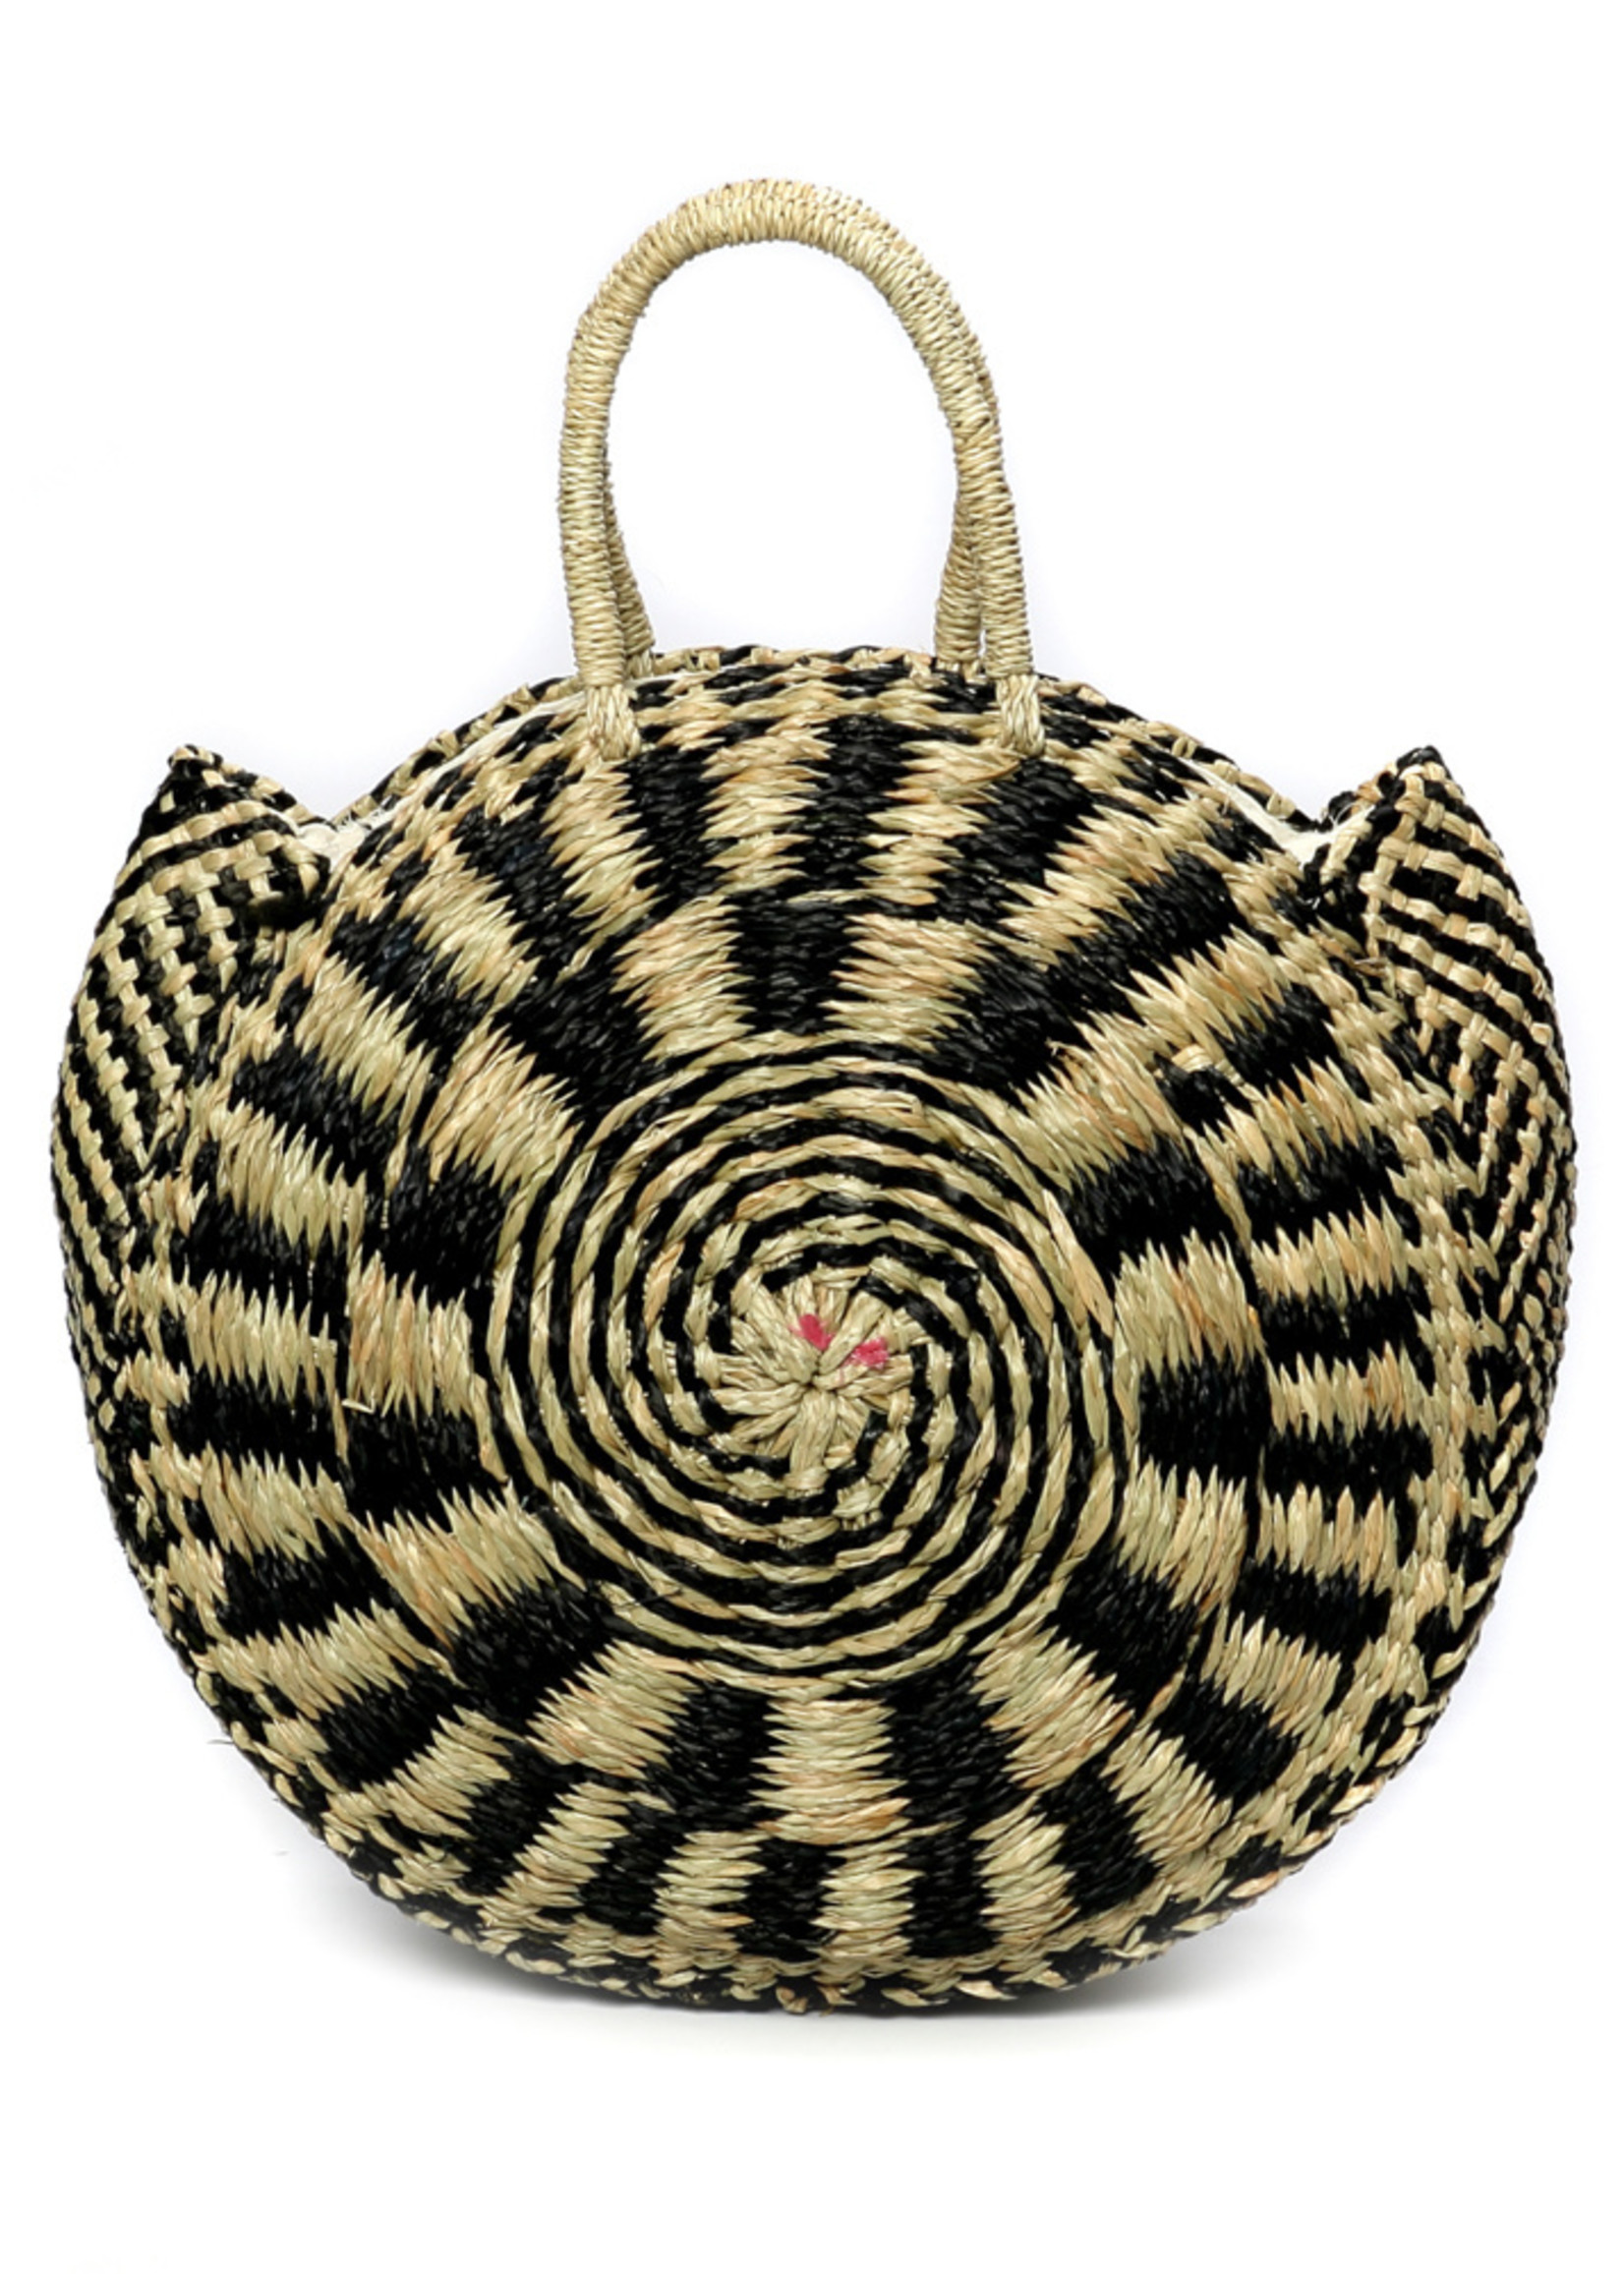 The Seagrass Pied Roundi Bag  - Natural Black - M